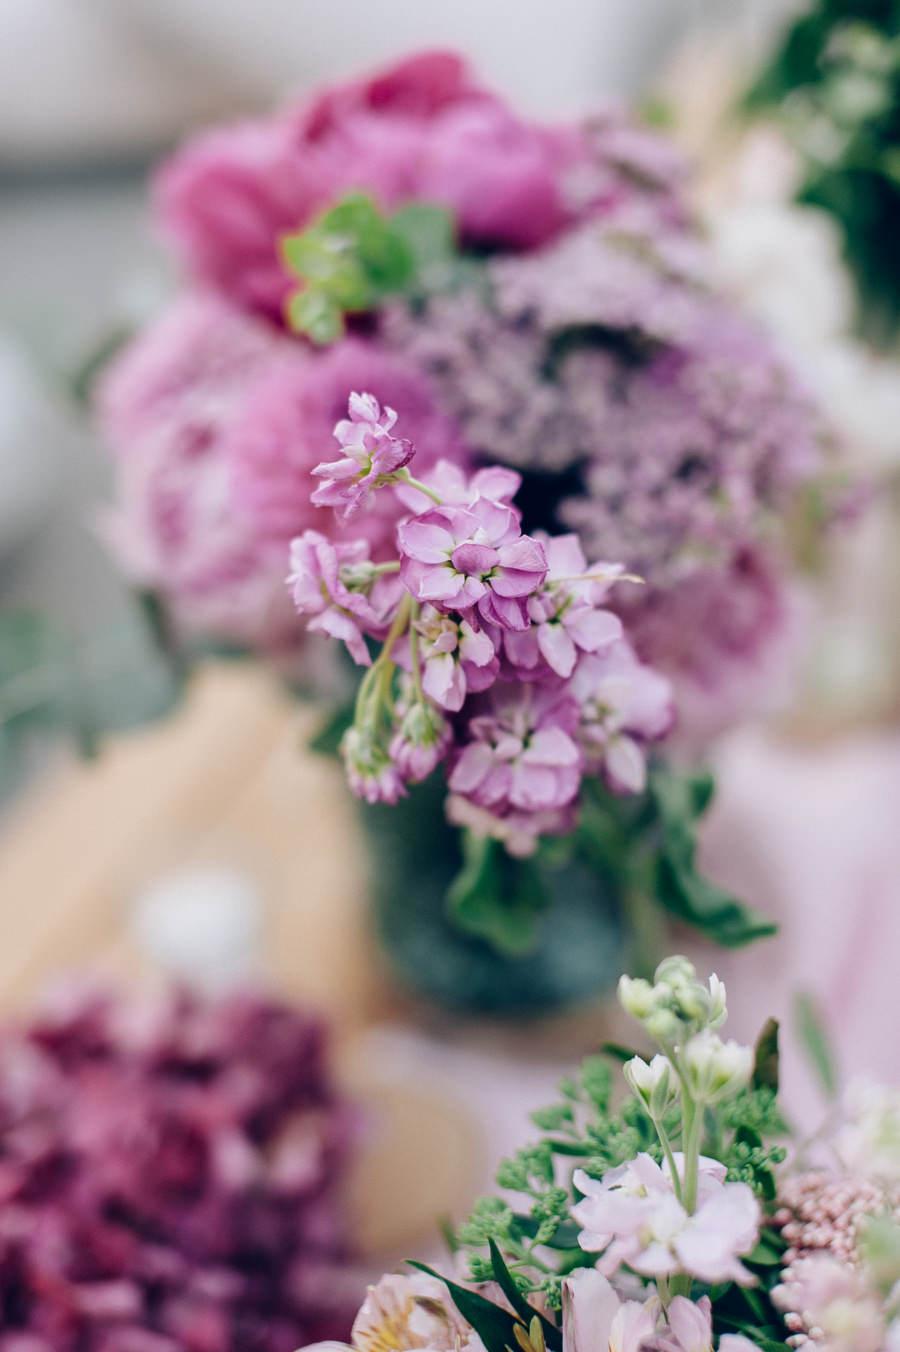 Flores para decorar tipis chill out 4